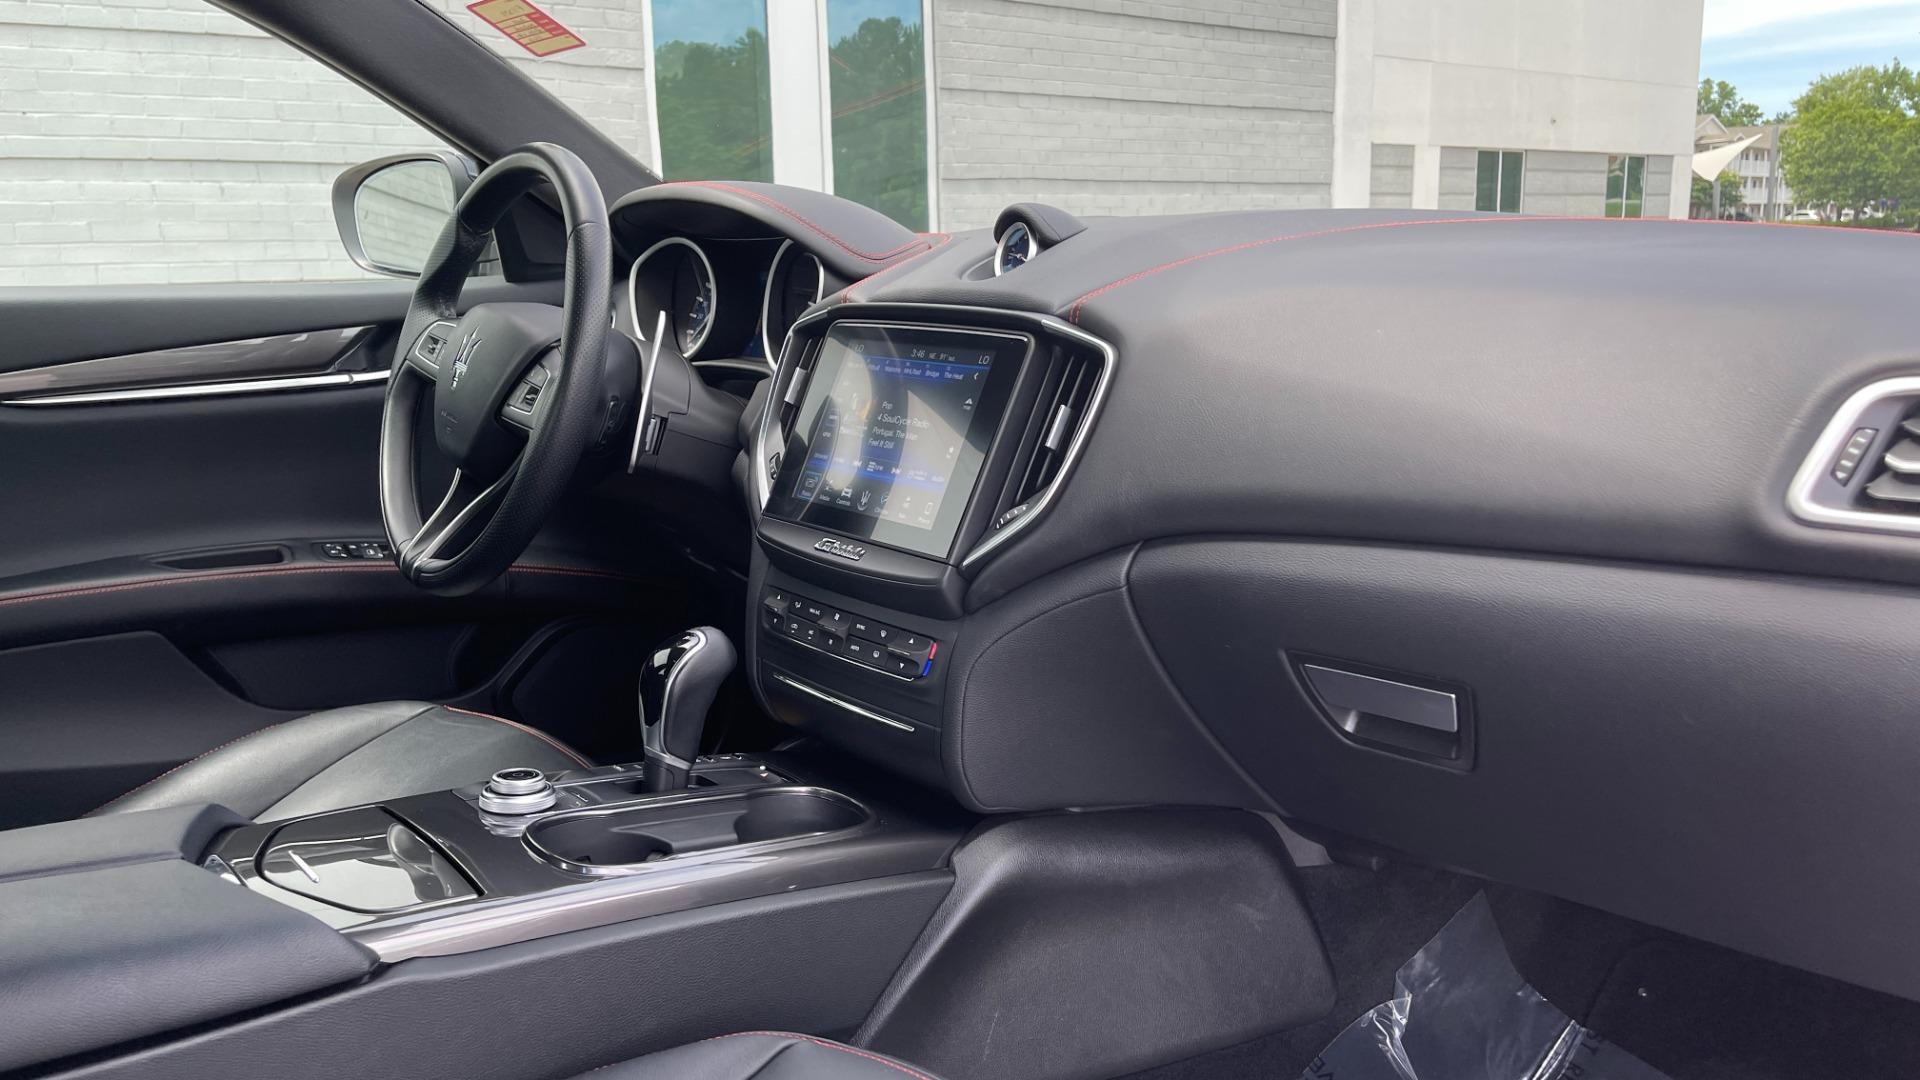 Used 2018 Maserati GHIBLI S Q4 SEDAN / AWD / 3.0L V6 / SUNROOF / NAV / REARVIEW for sale $51,995 at Formula Imports in Charlotte NC 28227 64